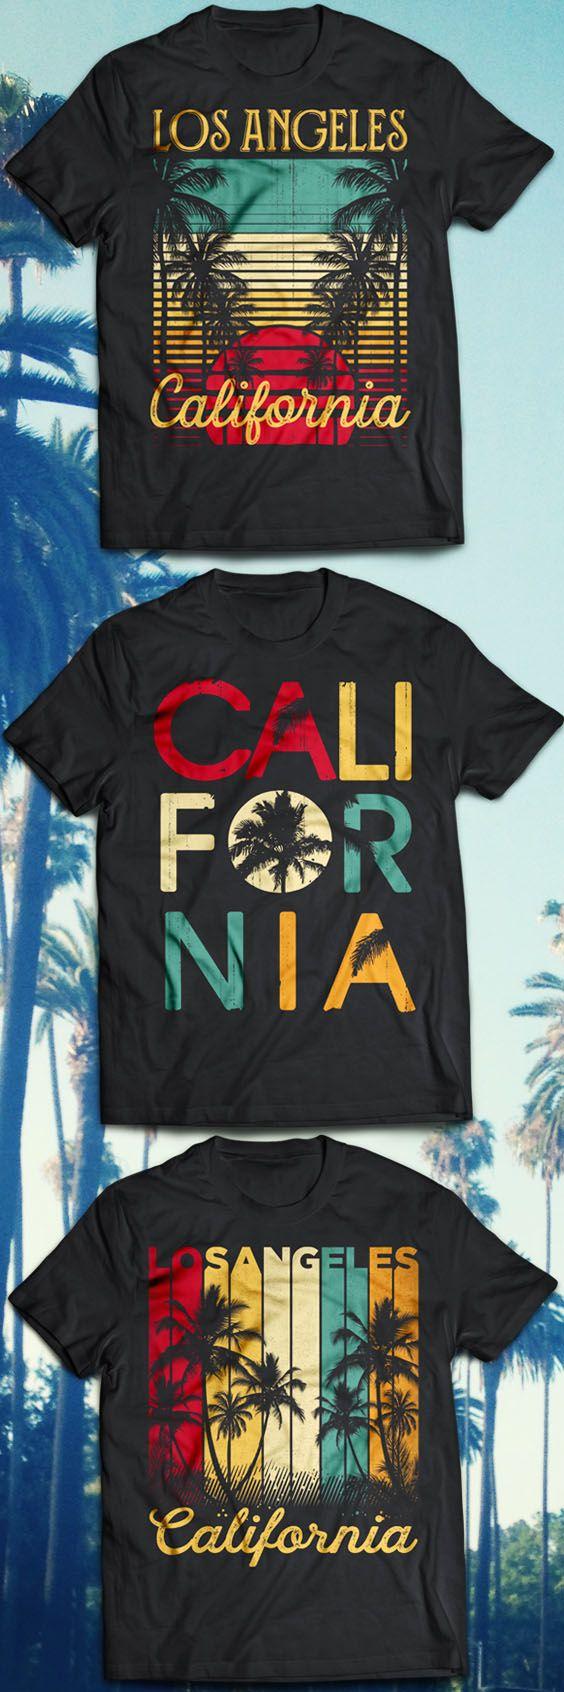 Los Angeles California Vintage Series. Palm Trees